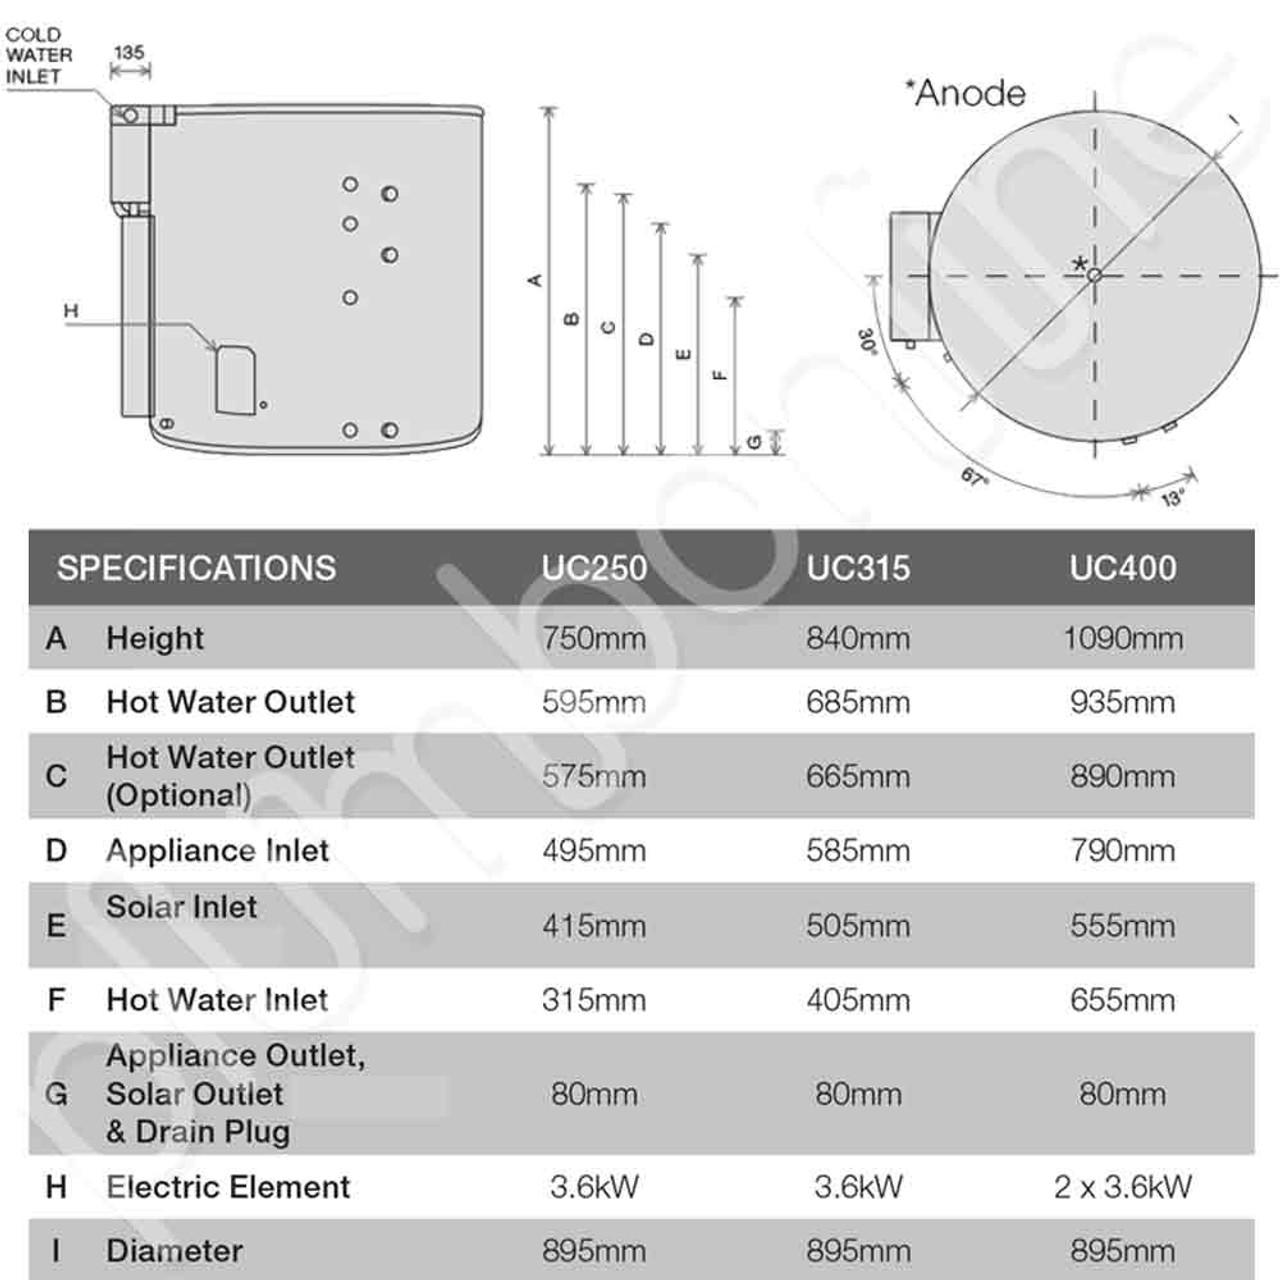 schematic g2 tech universal wet back stove hot water heater mains pressure coil 250lt spec  [ 1000 x 1000 Pixel ]